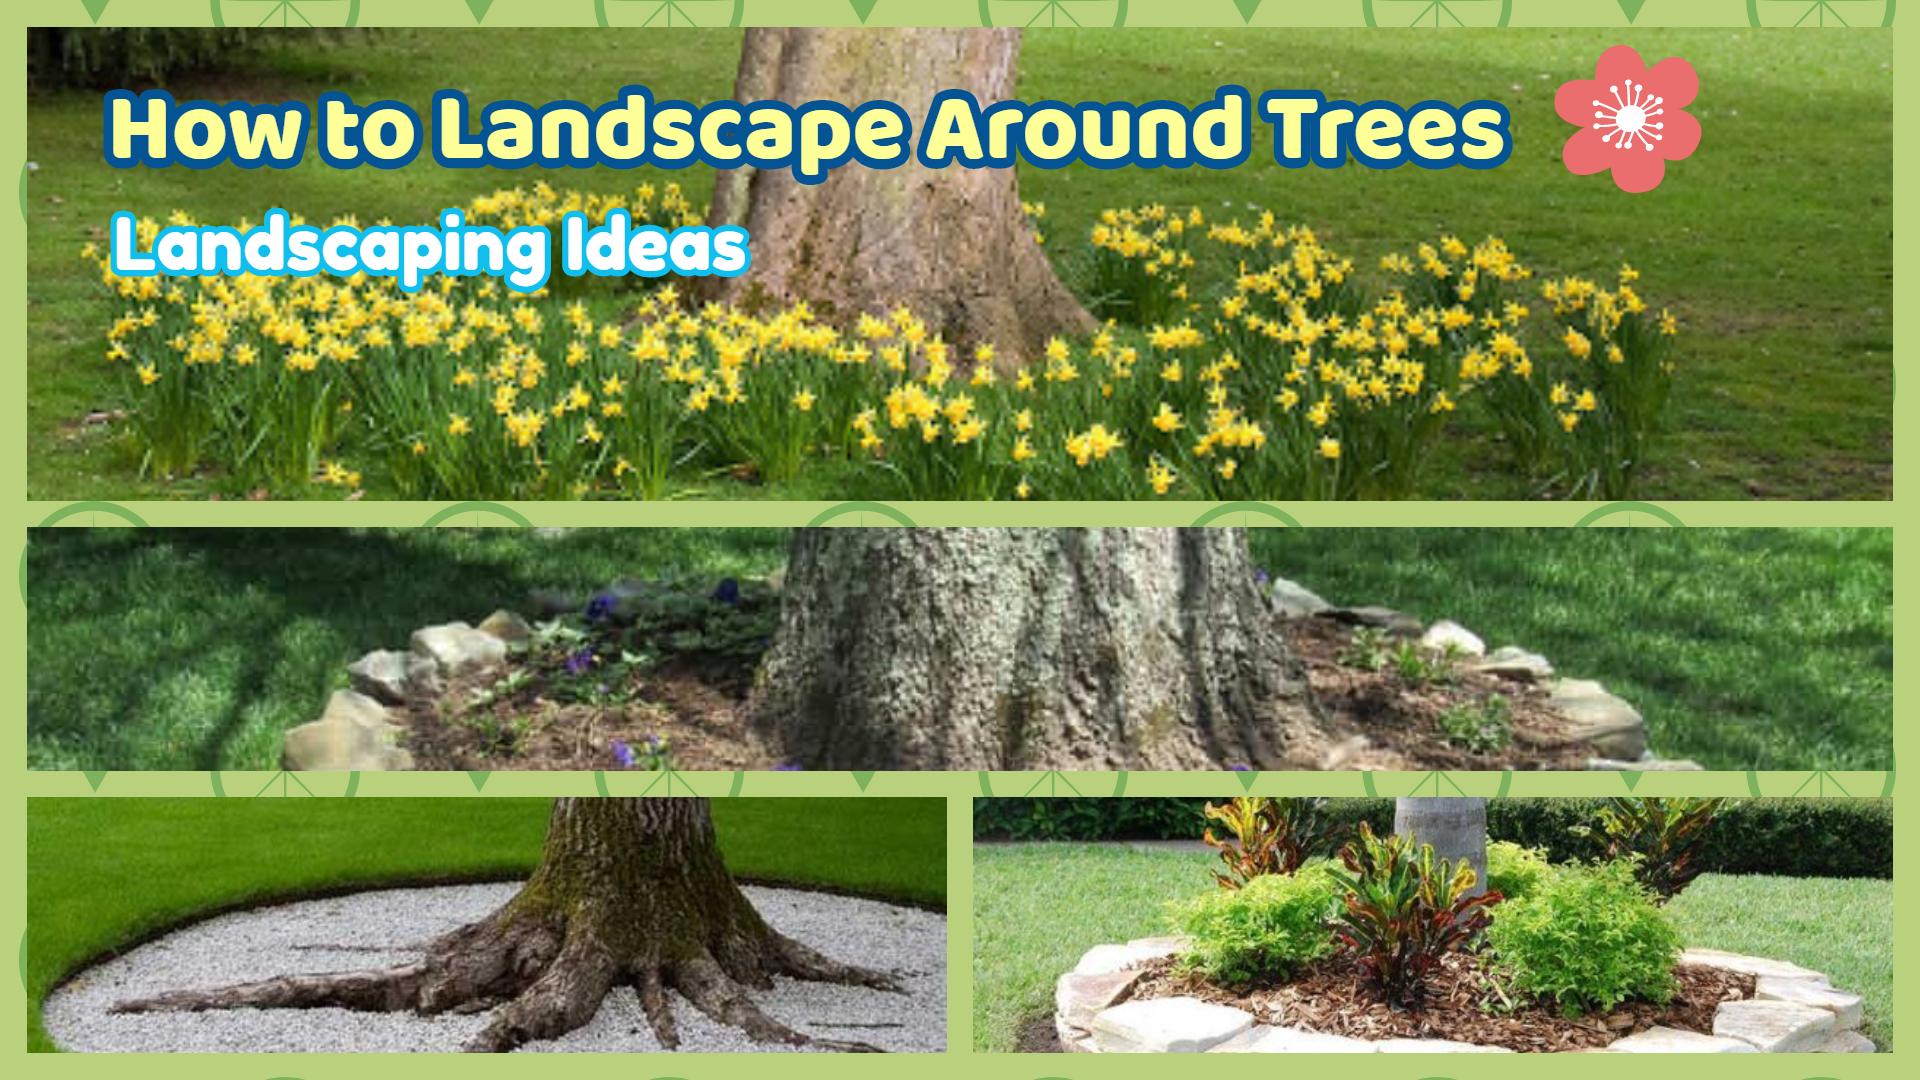 How to Landscape Around Trees